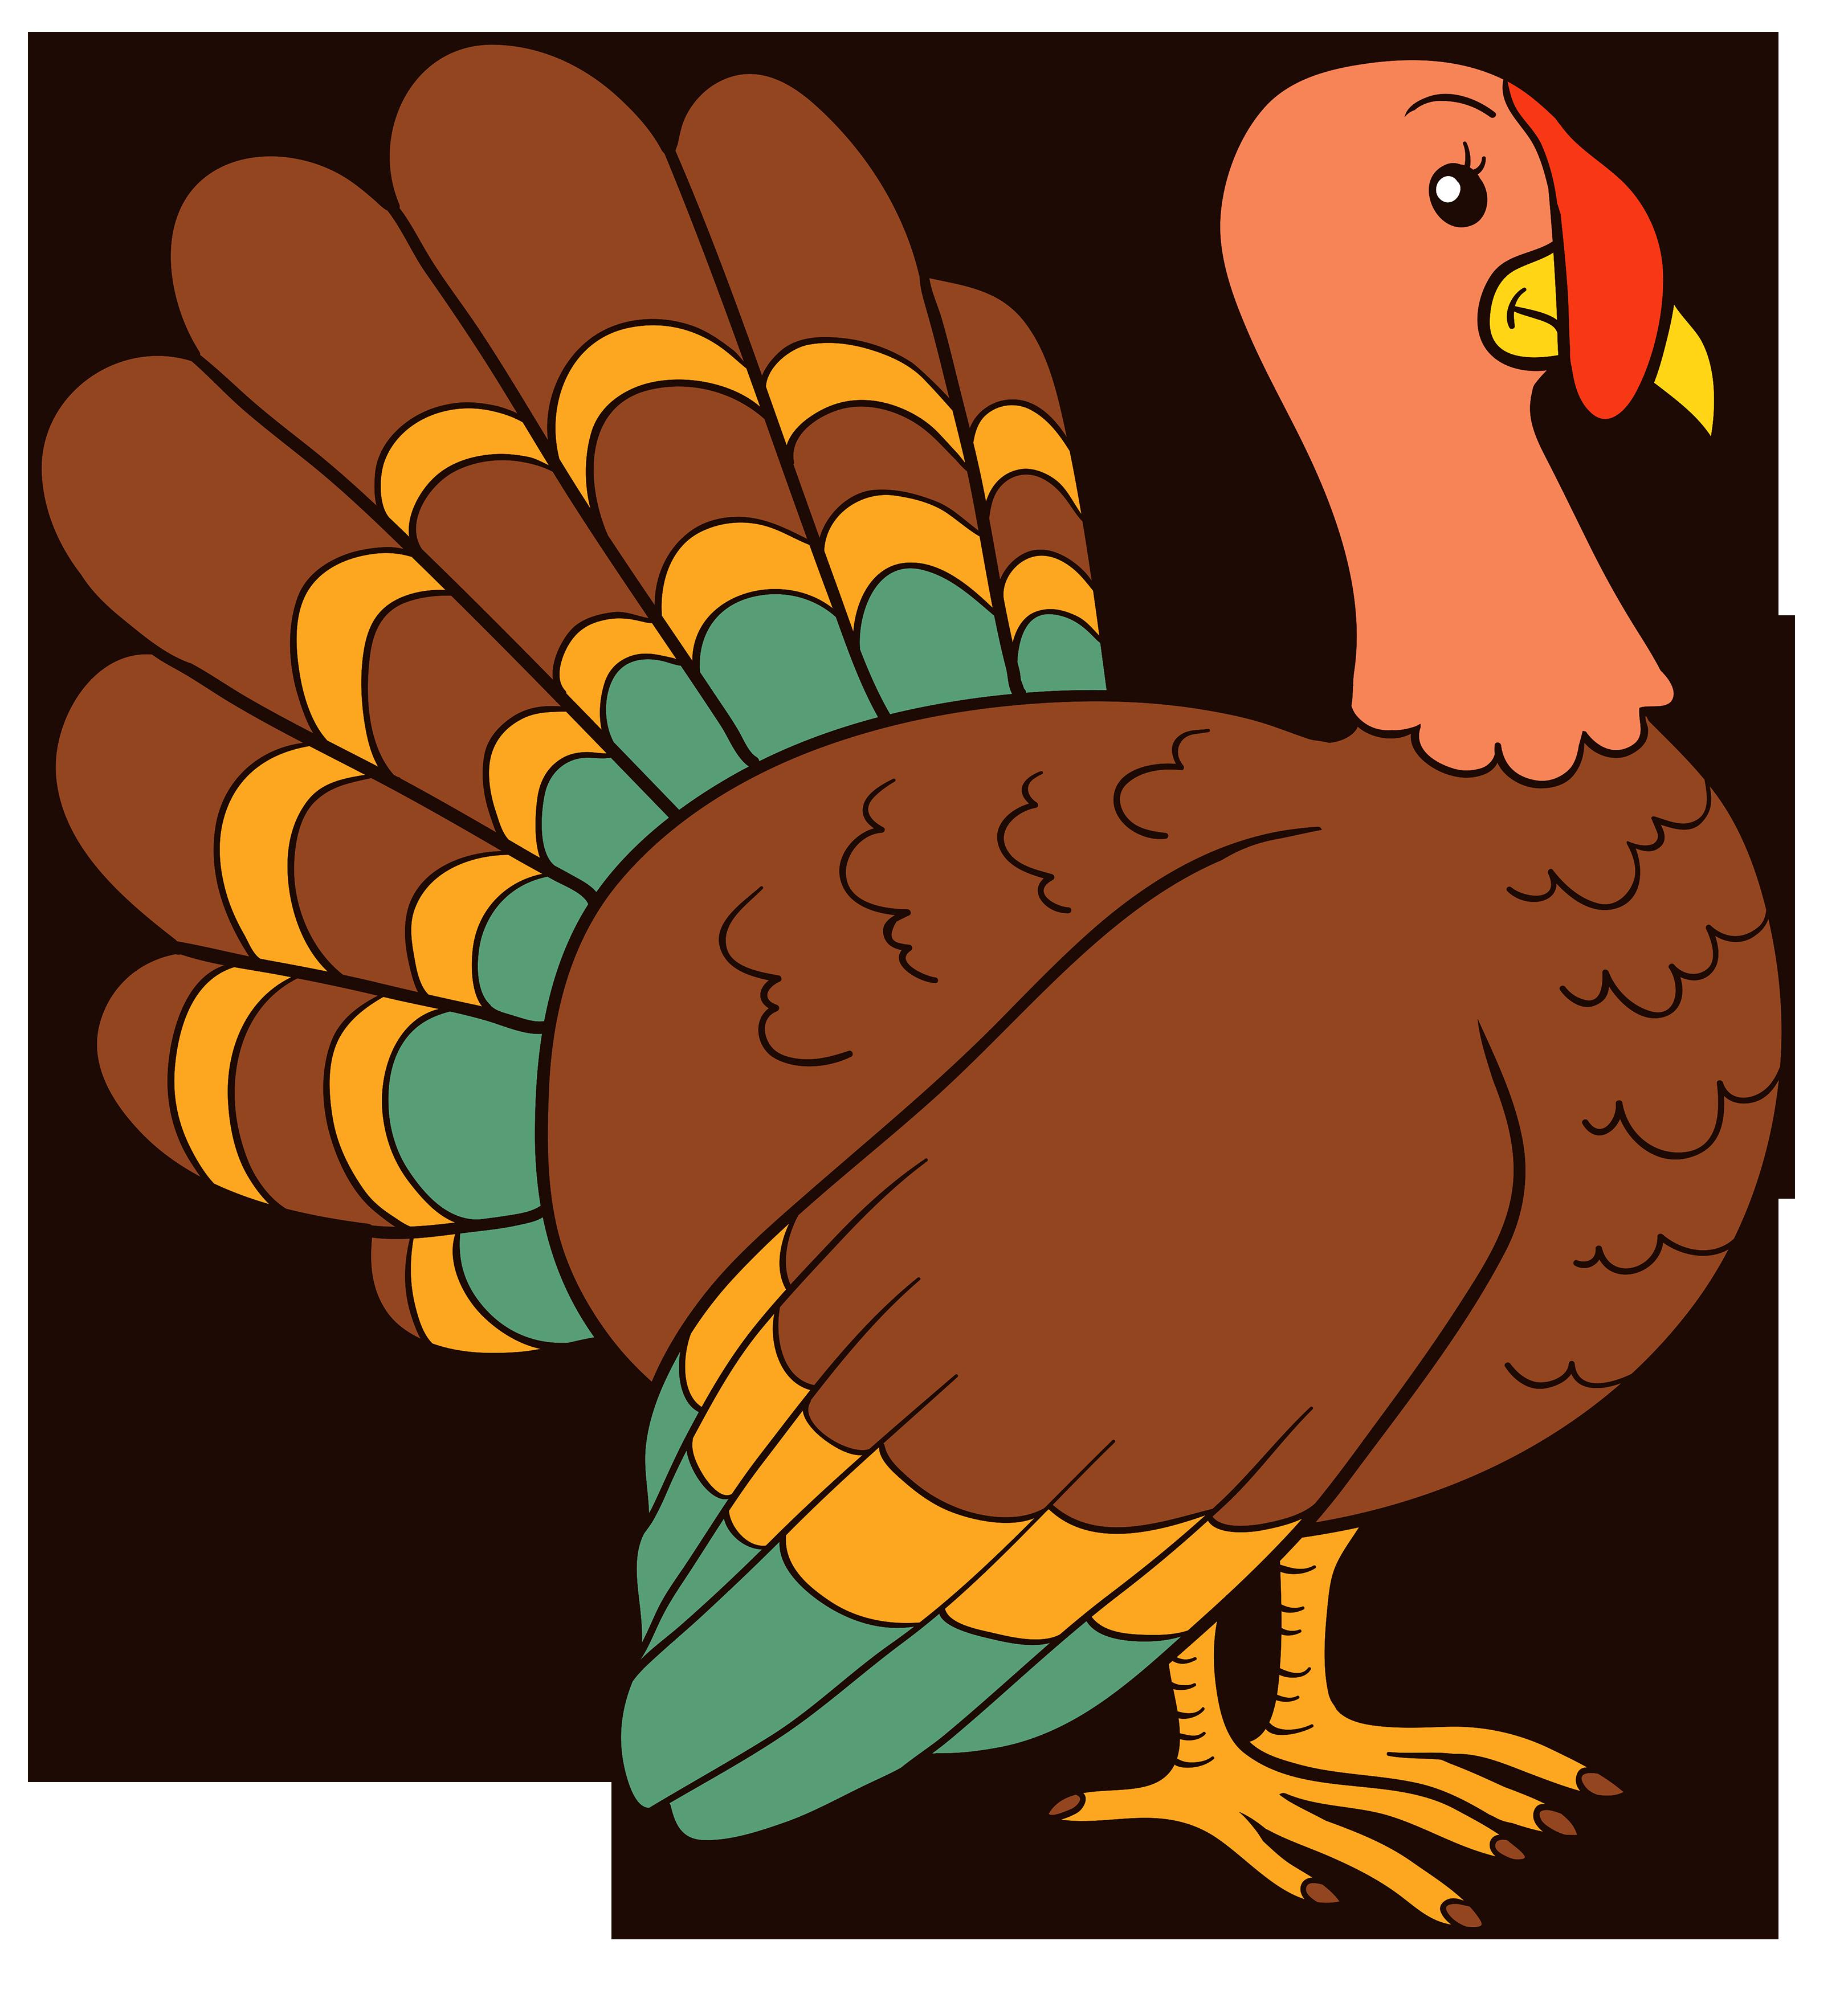 Png image best web. Clipart turkey